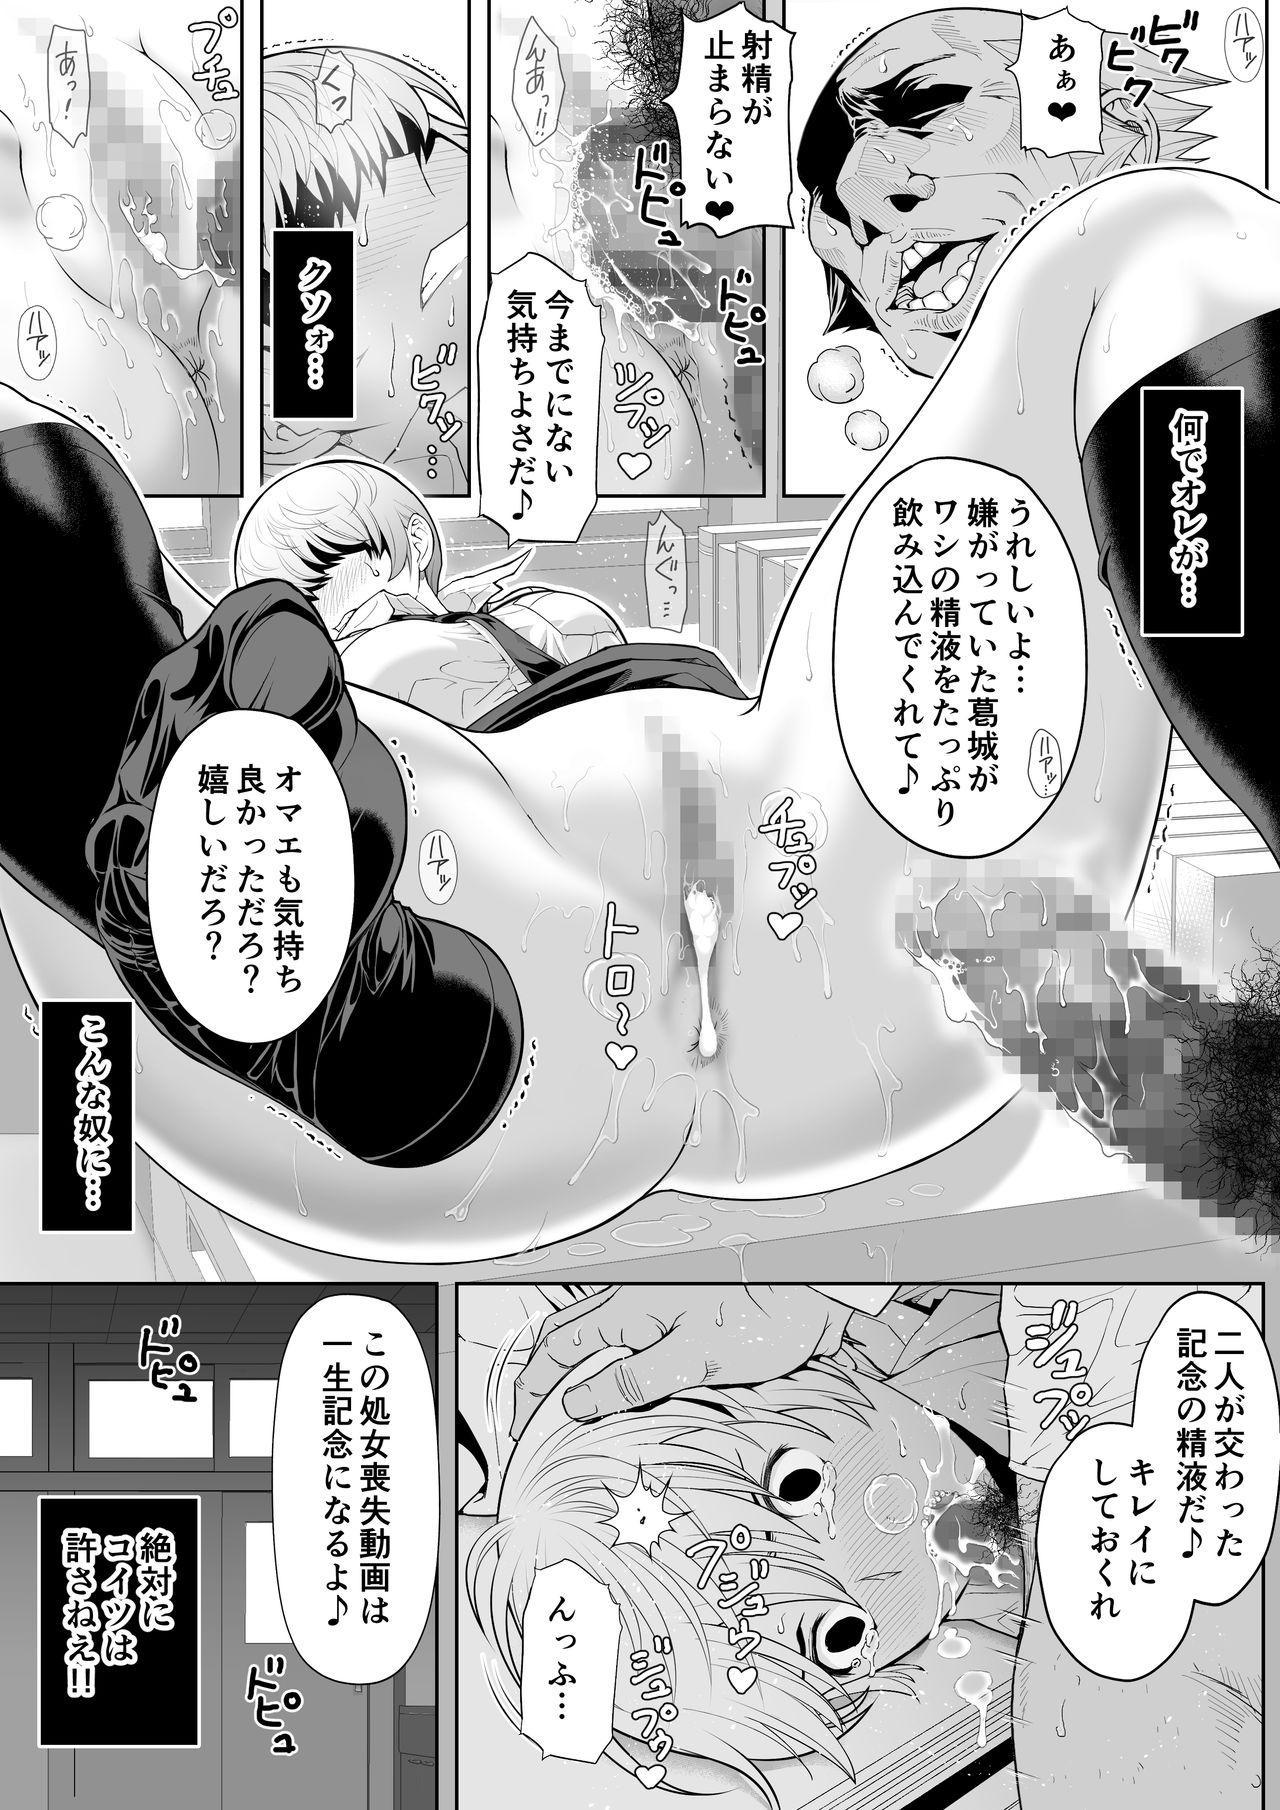 Namaiki mmusume ni tsuyo ● ikīki jugyō 48